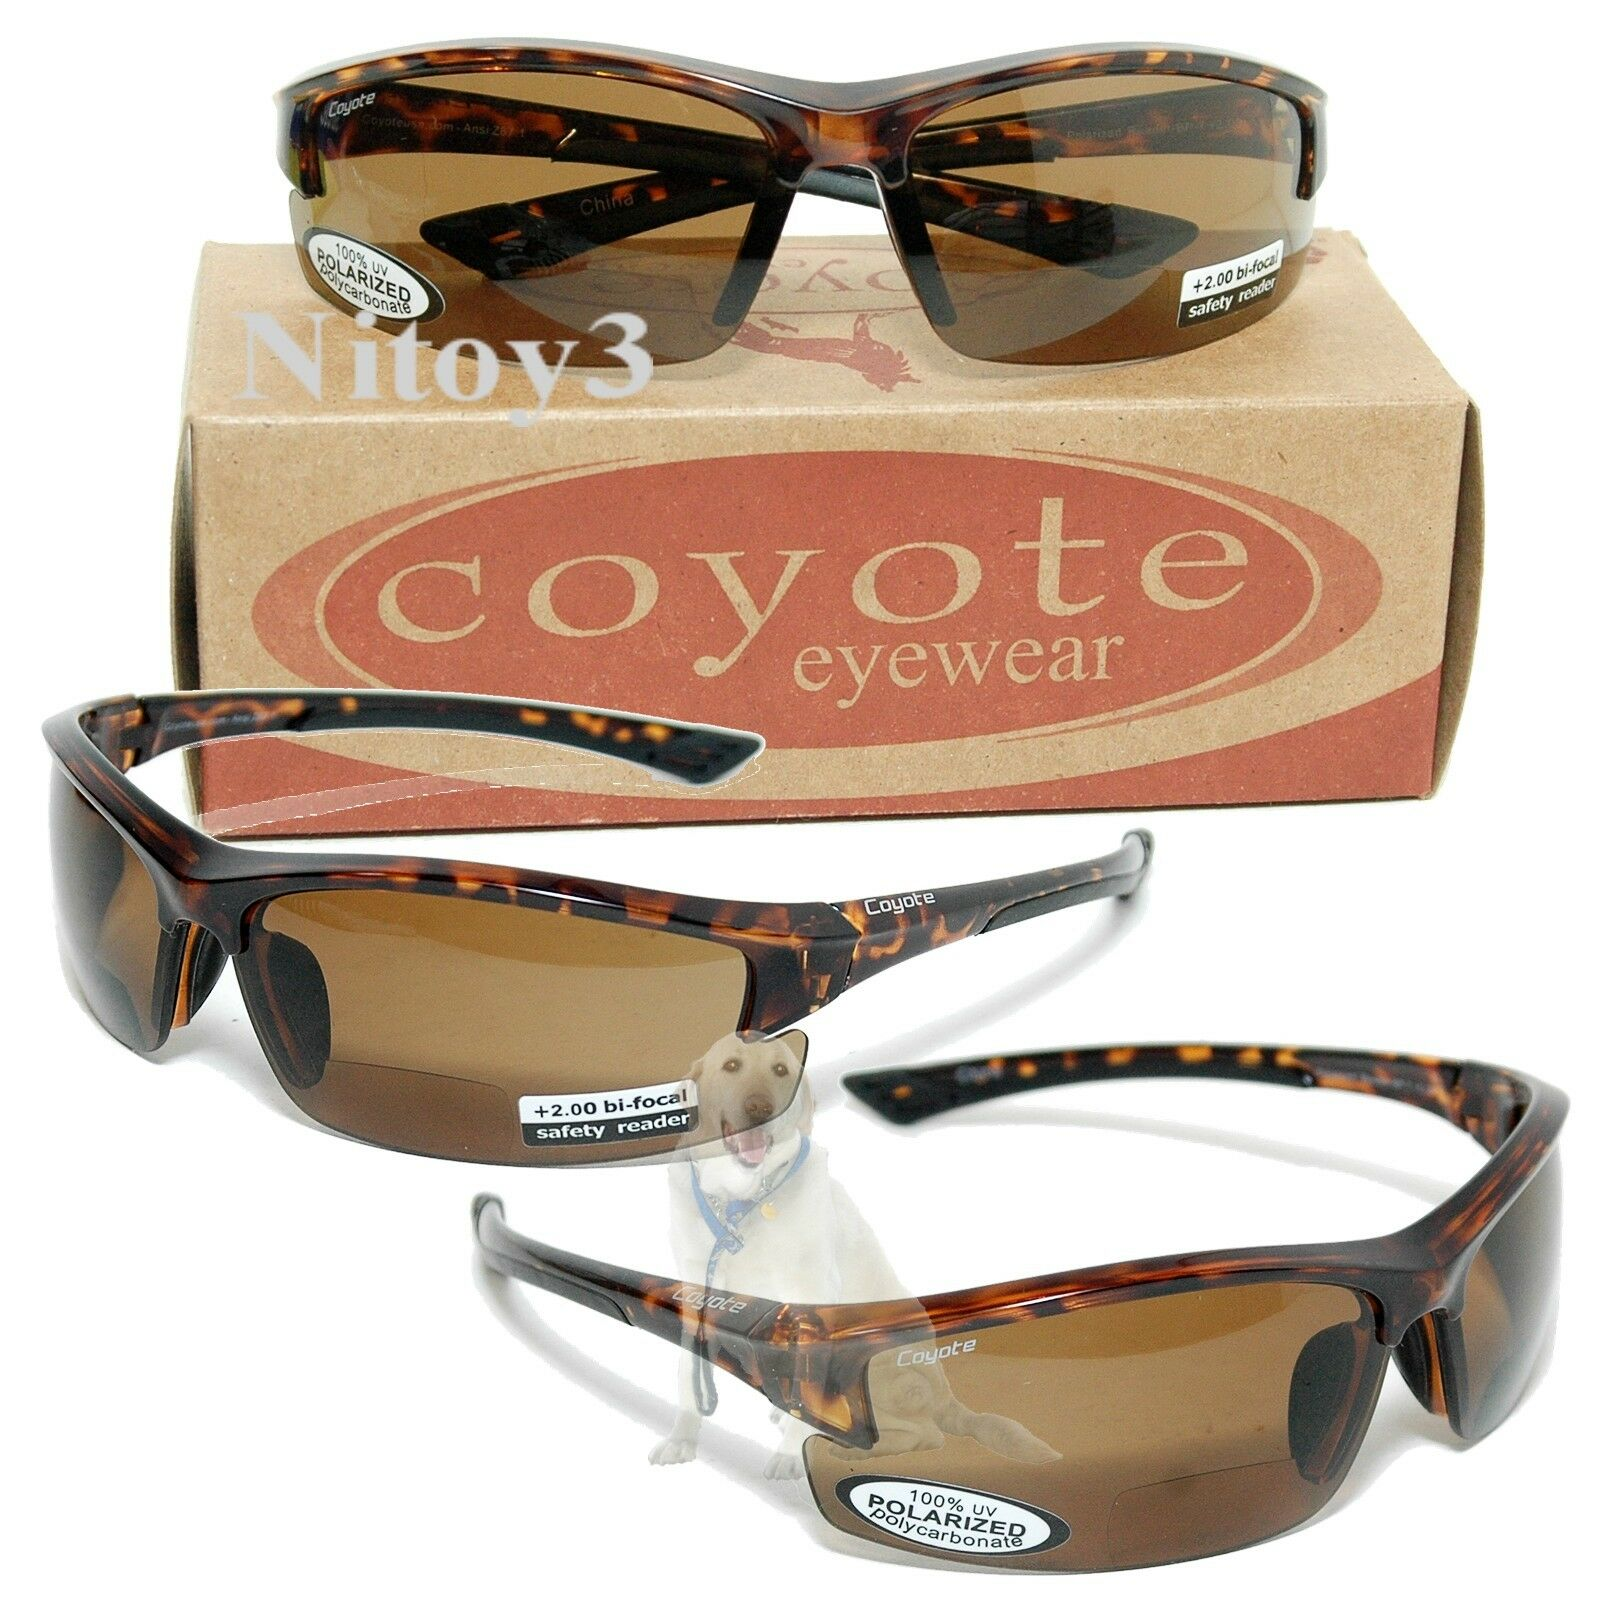 Coyote Eyewear BP7 Sunglasses  Polarized, BiFocal 2.0 Large Fit